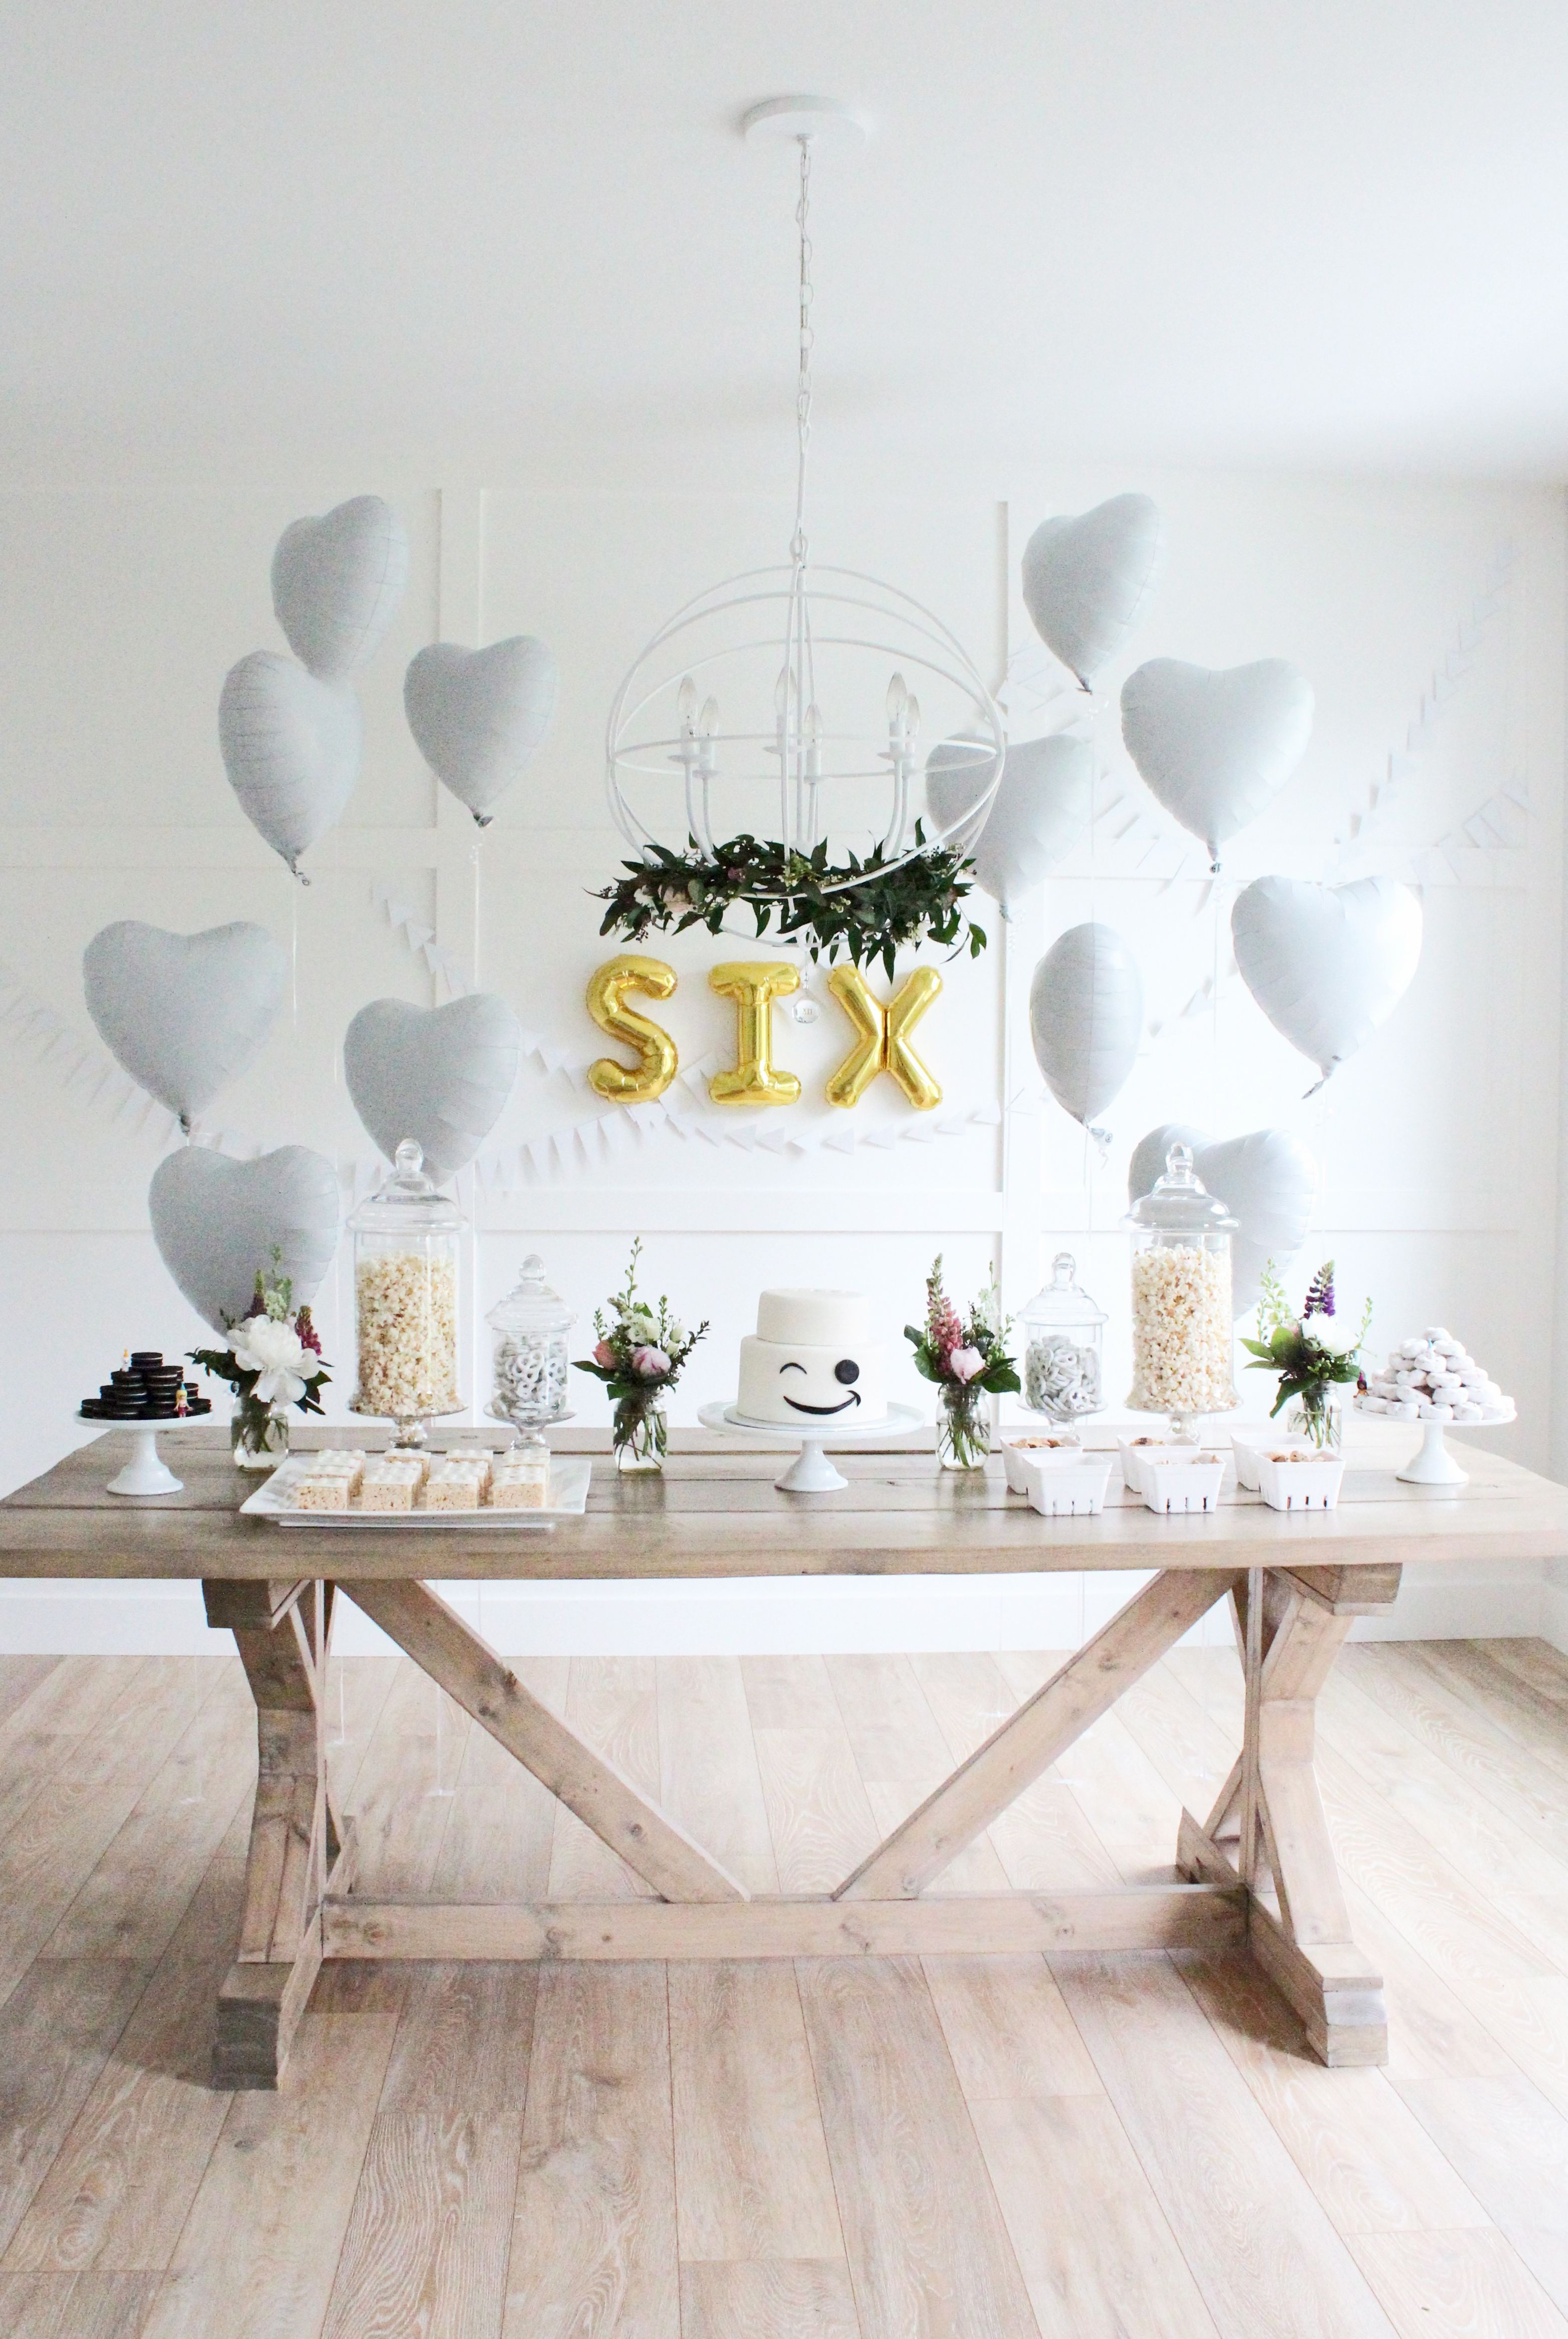 9 easy ways to decorate for a party c e l e b r a t e ariella turns six lego party girl lego party cake birthday party mas